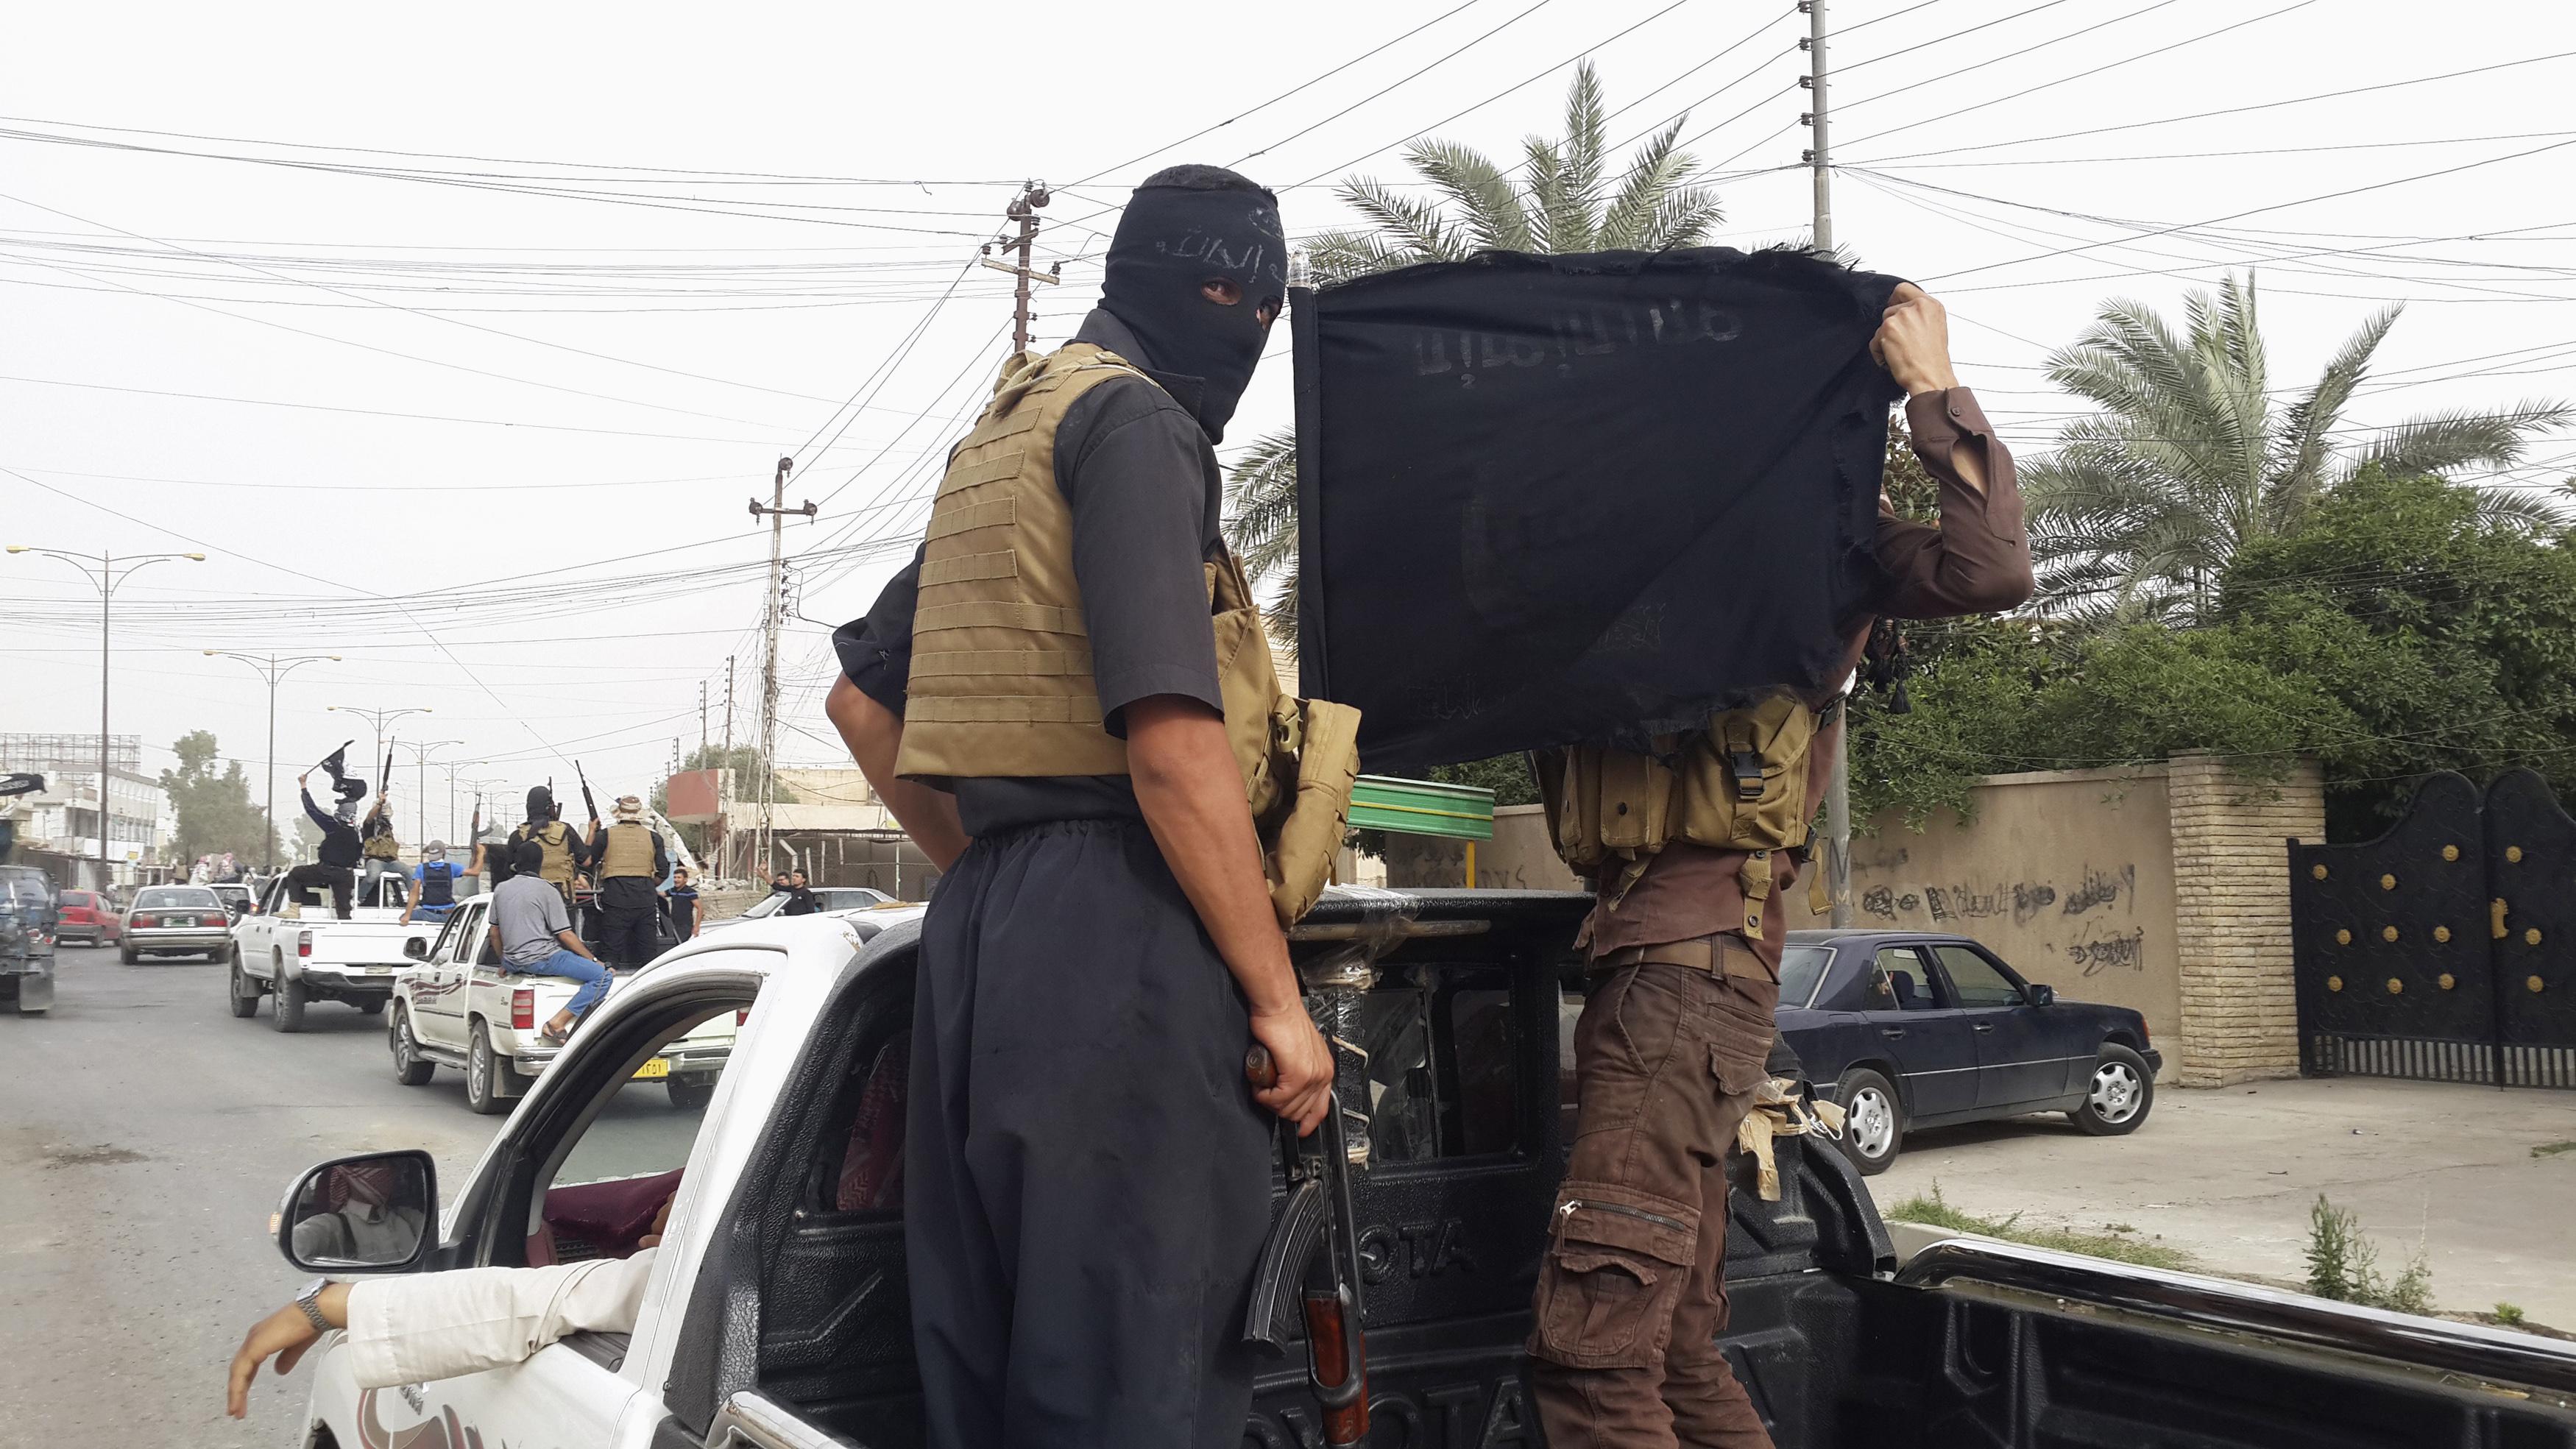 Arhivska fotografija: Borci ISIS-a u Mosulu